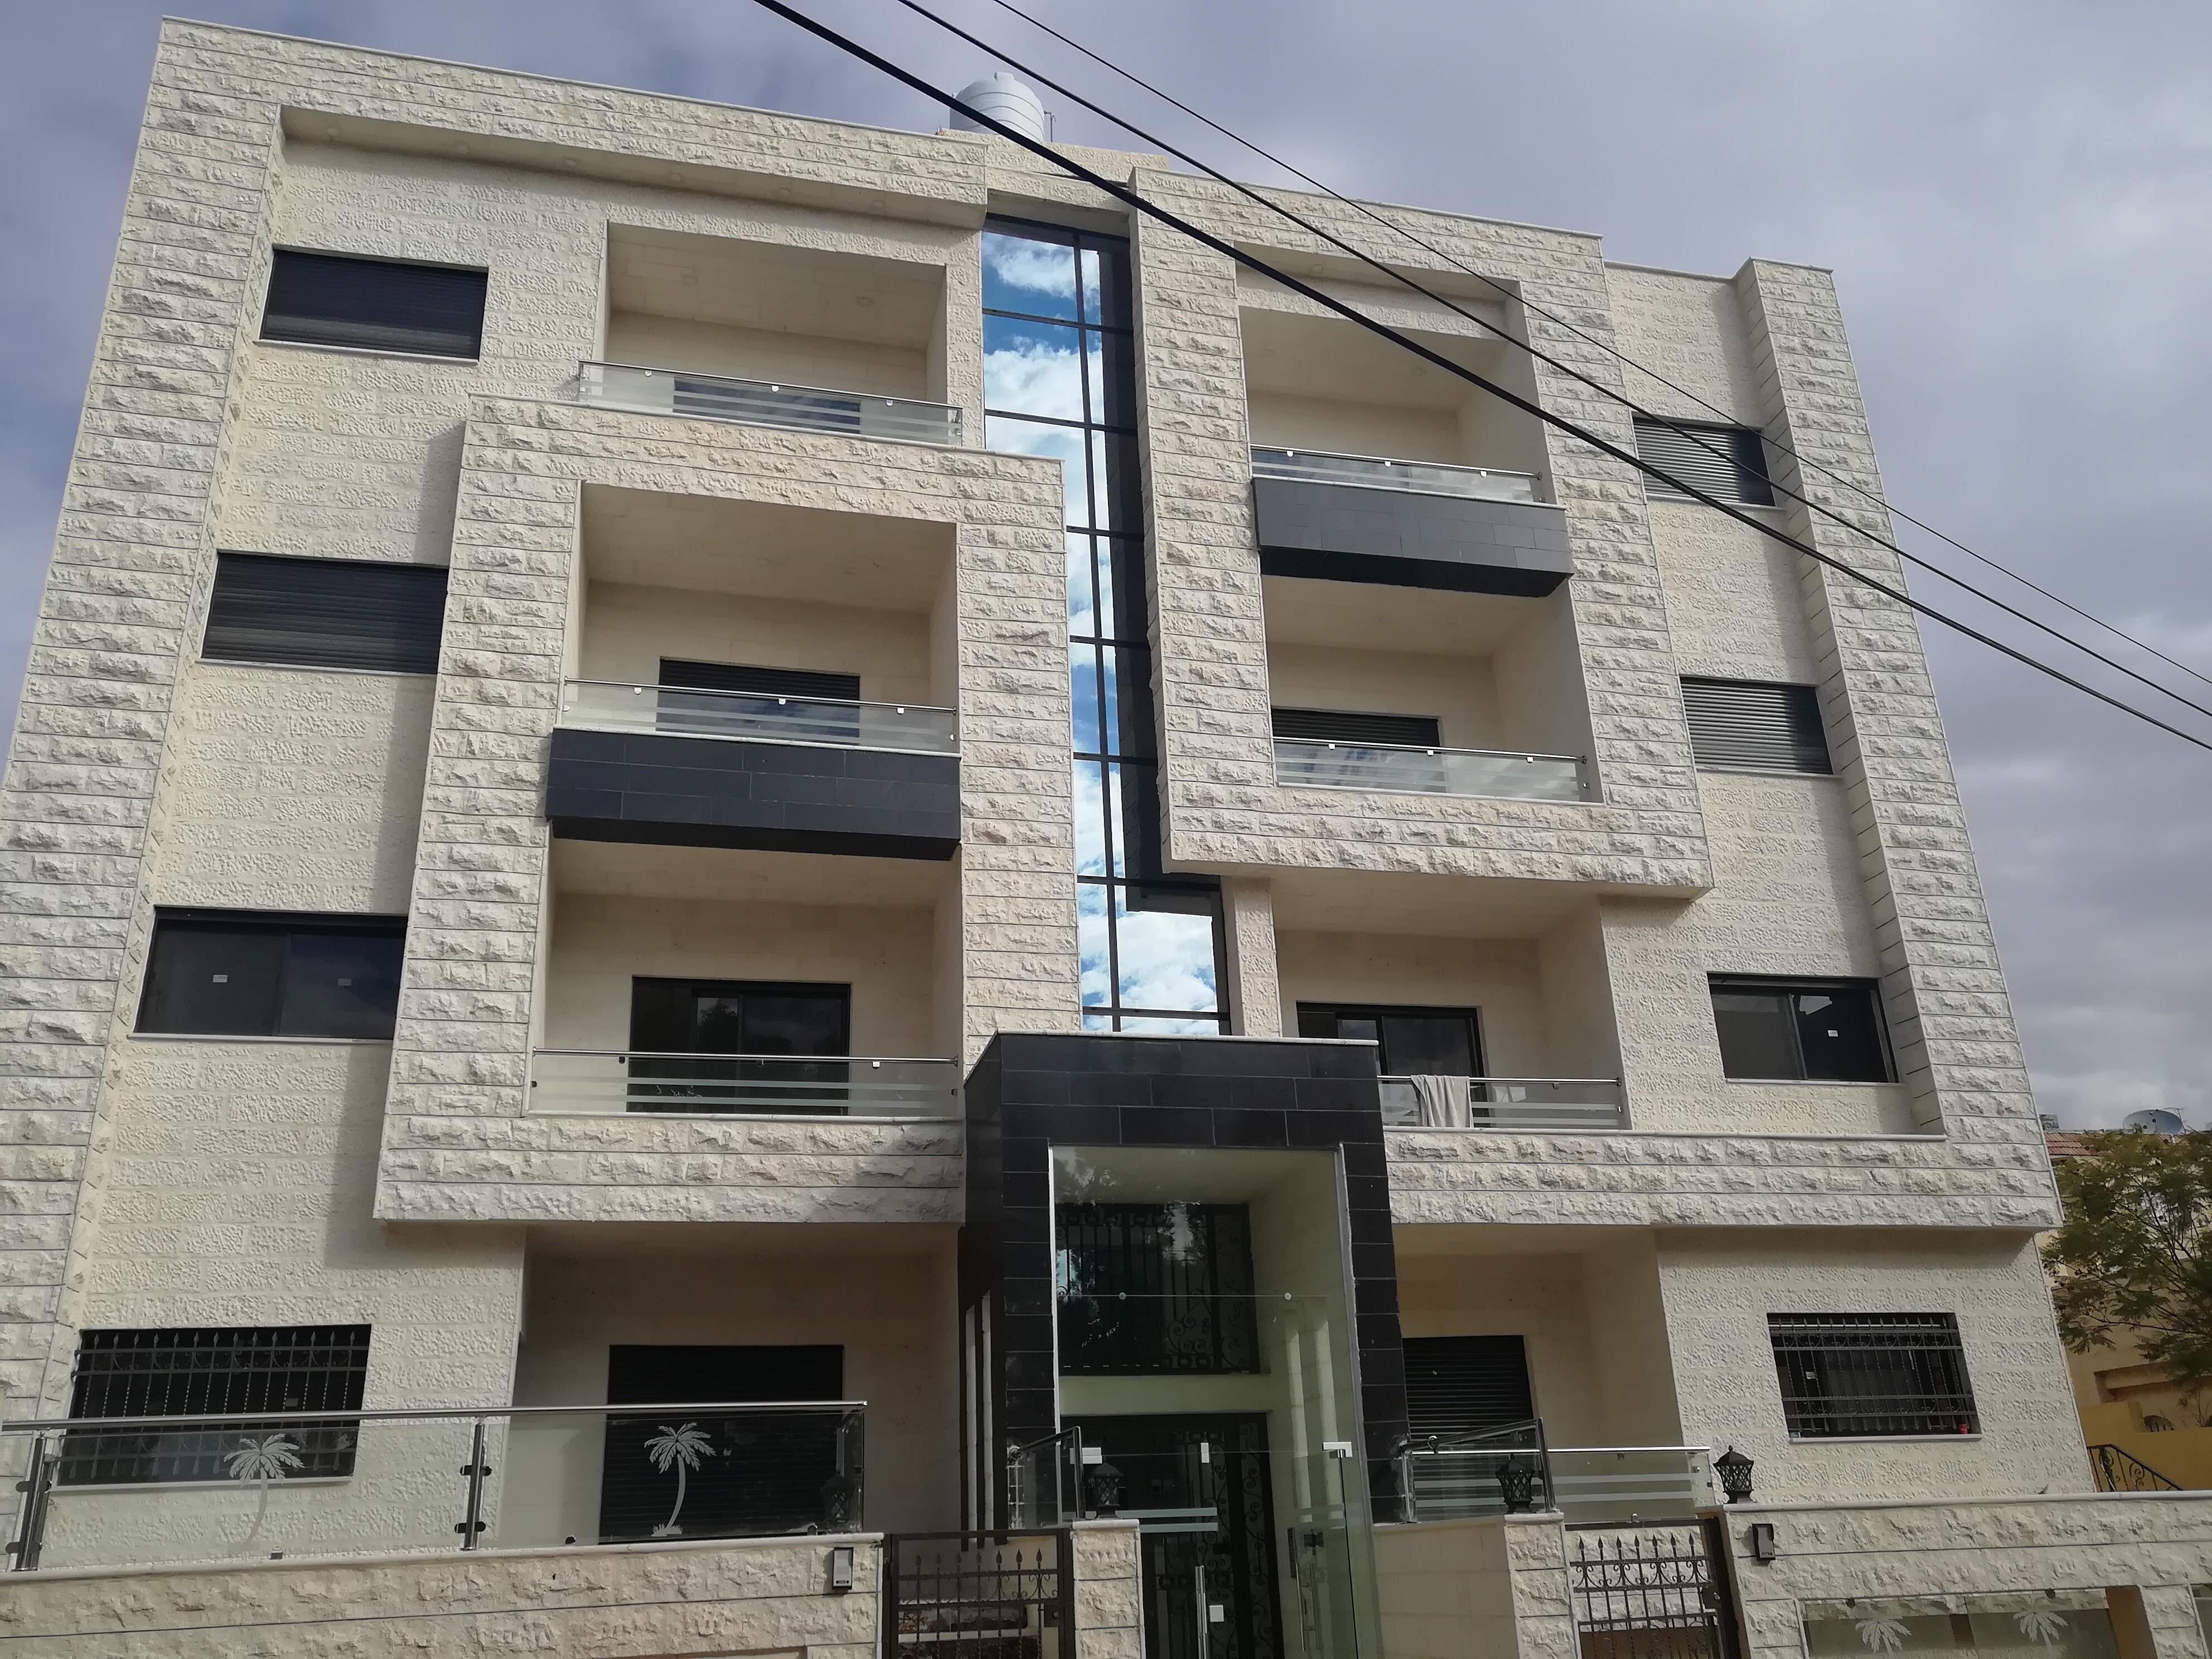 MONTHLY Fully Furnished Studio In Building Including Elect. Water & Wifi In Hamdan Street Near Al Hosn 4500-  استوديوهات بالاقساط بجانب...